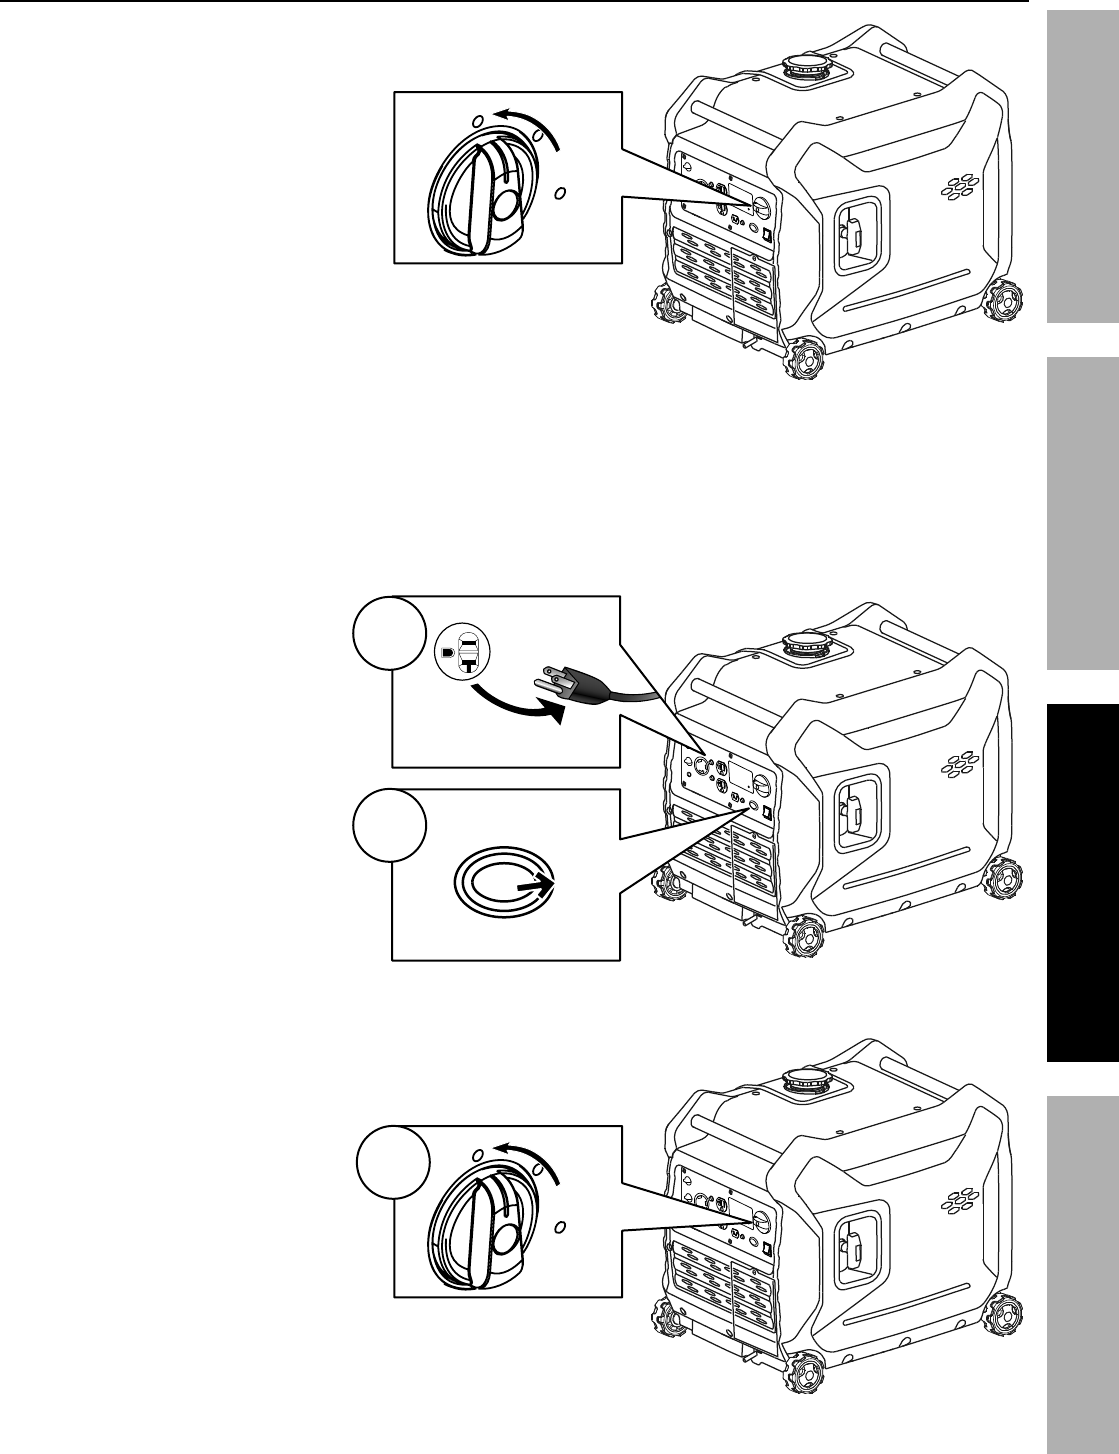 Manual For The 63584 3500 Watt Super Quiet Inverter Generator